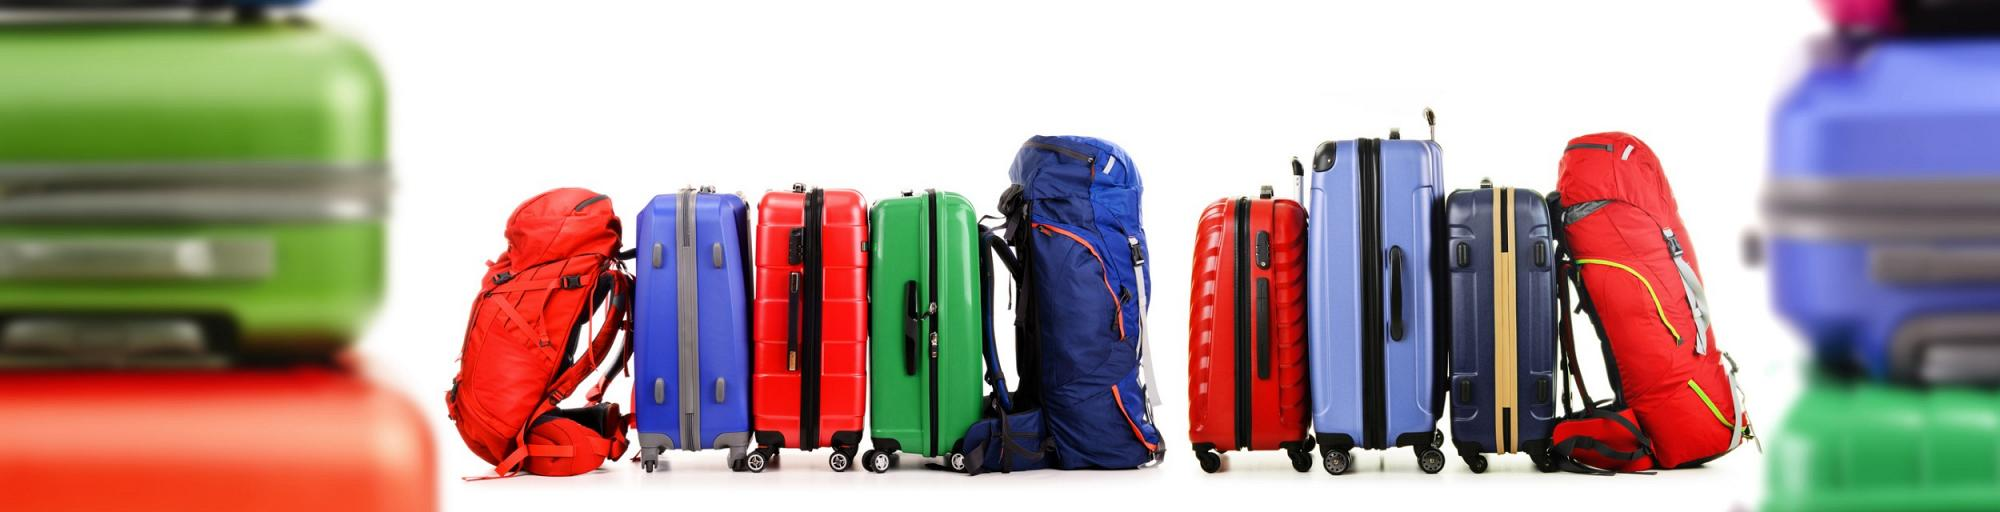 Koffer & Rucksäcke leihen